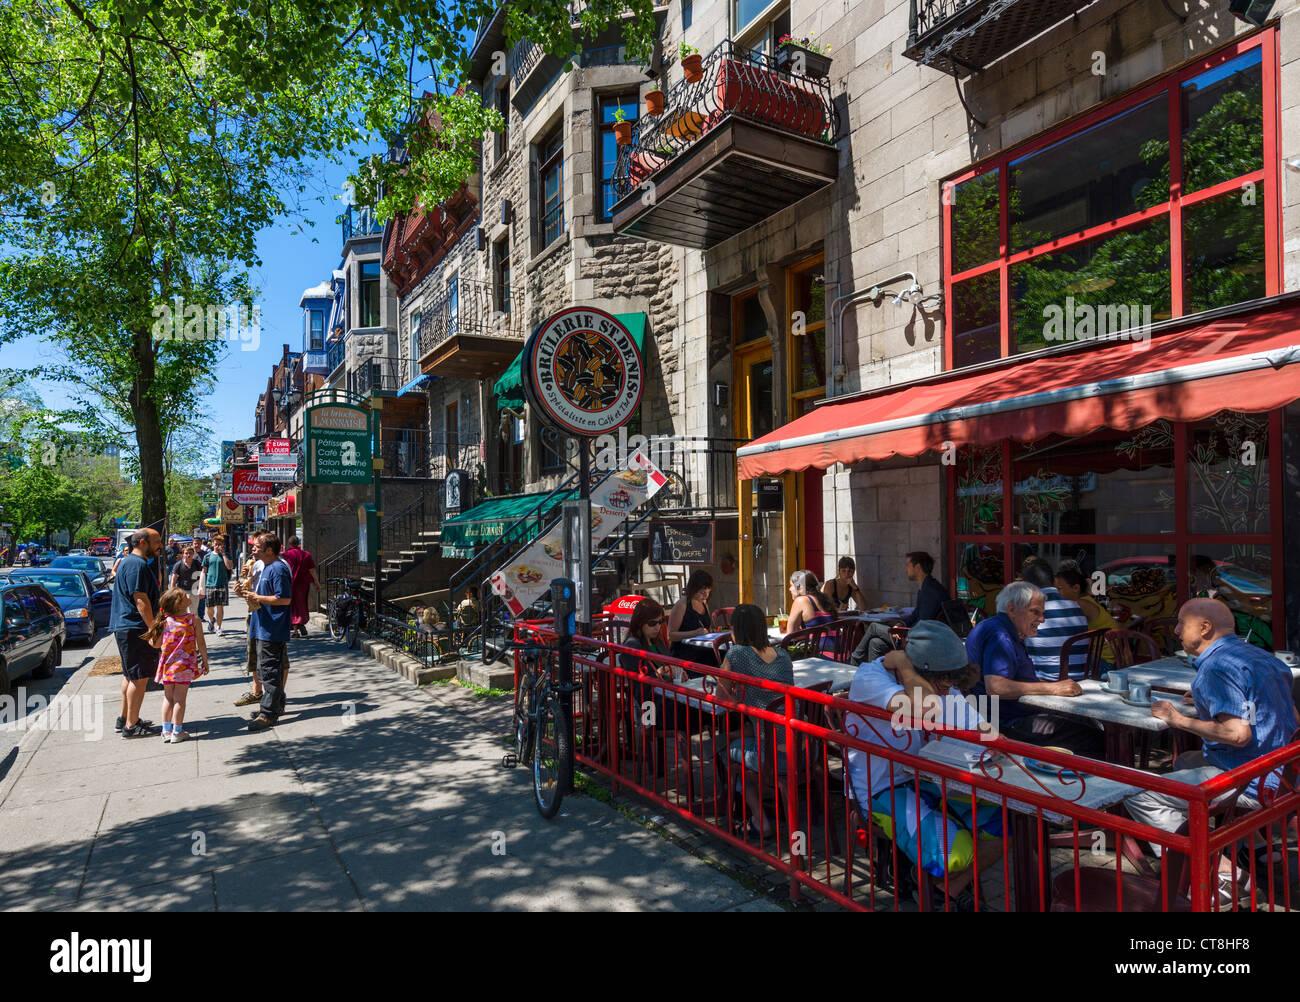 Bars cafes and restaurants along rue saint denis in the for Meubles montreal st denis